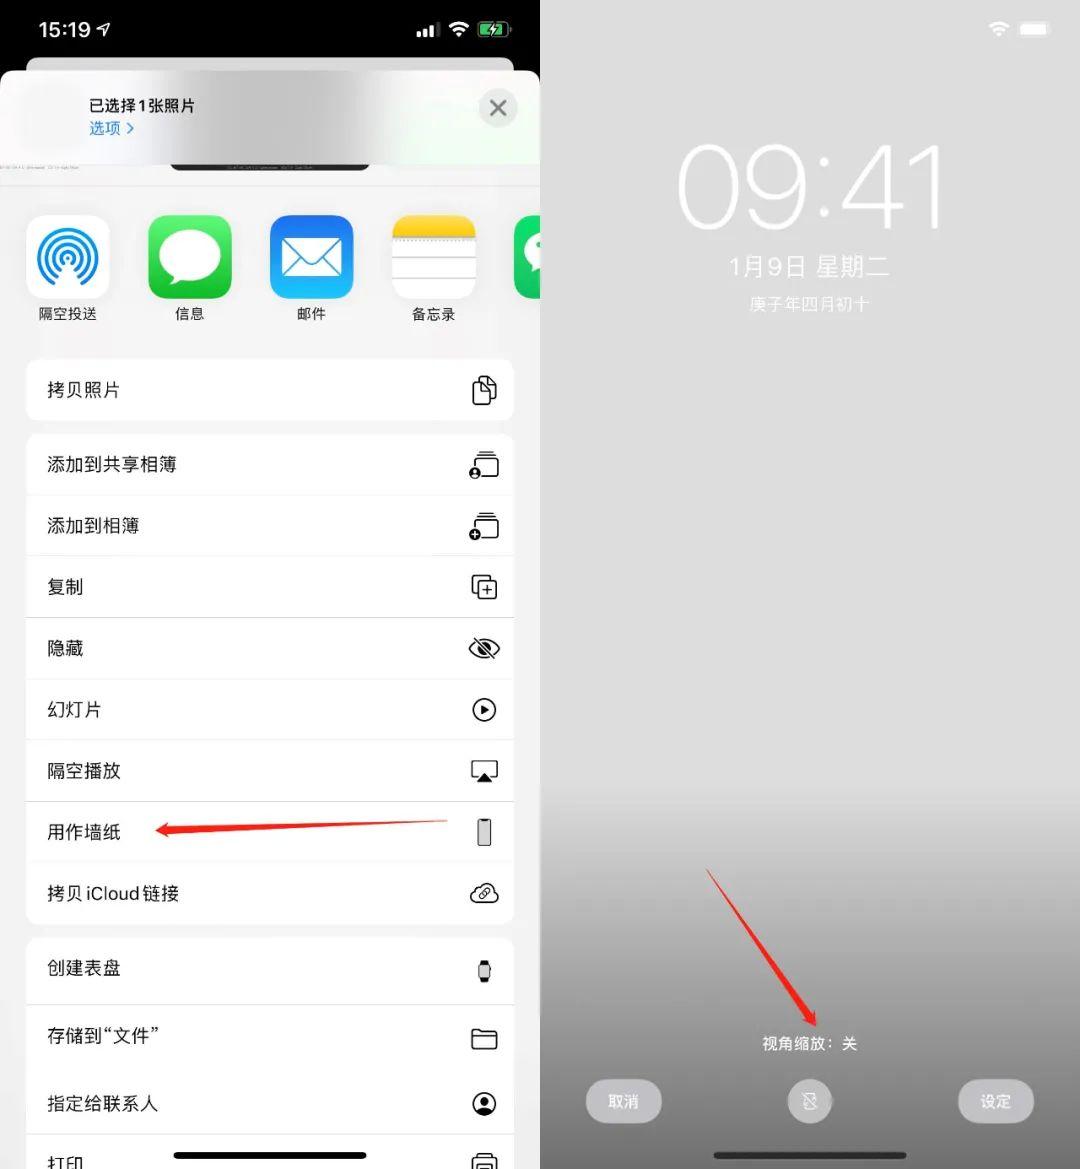 iPhone一键修改所有App,瞬间和别人不一样!第5张-菜鸟分享